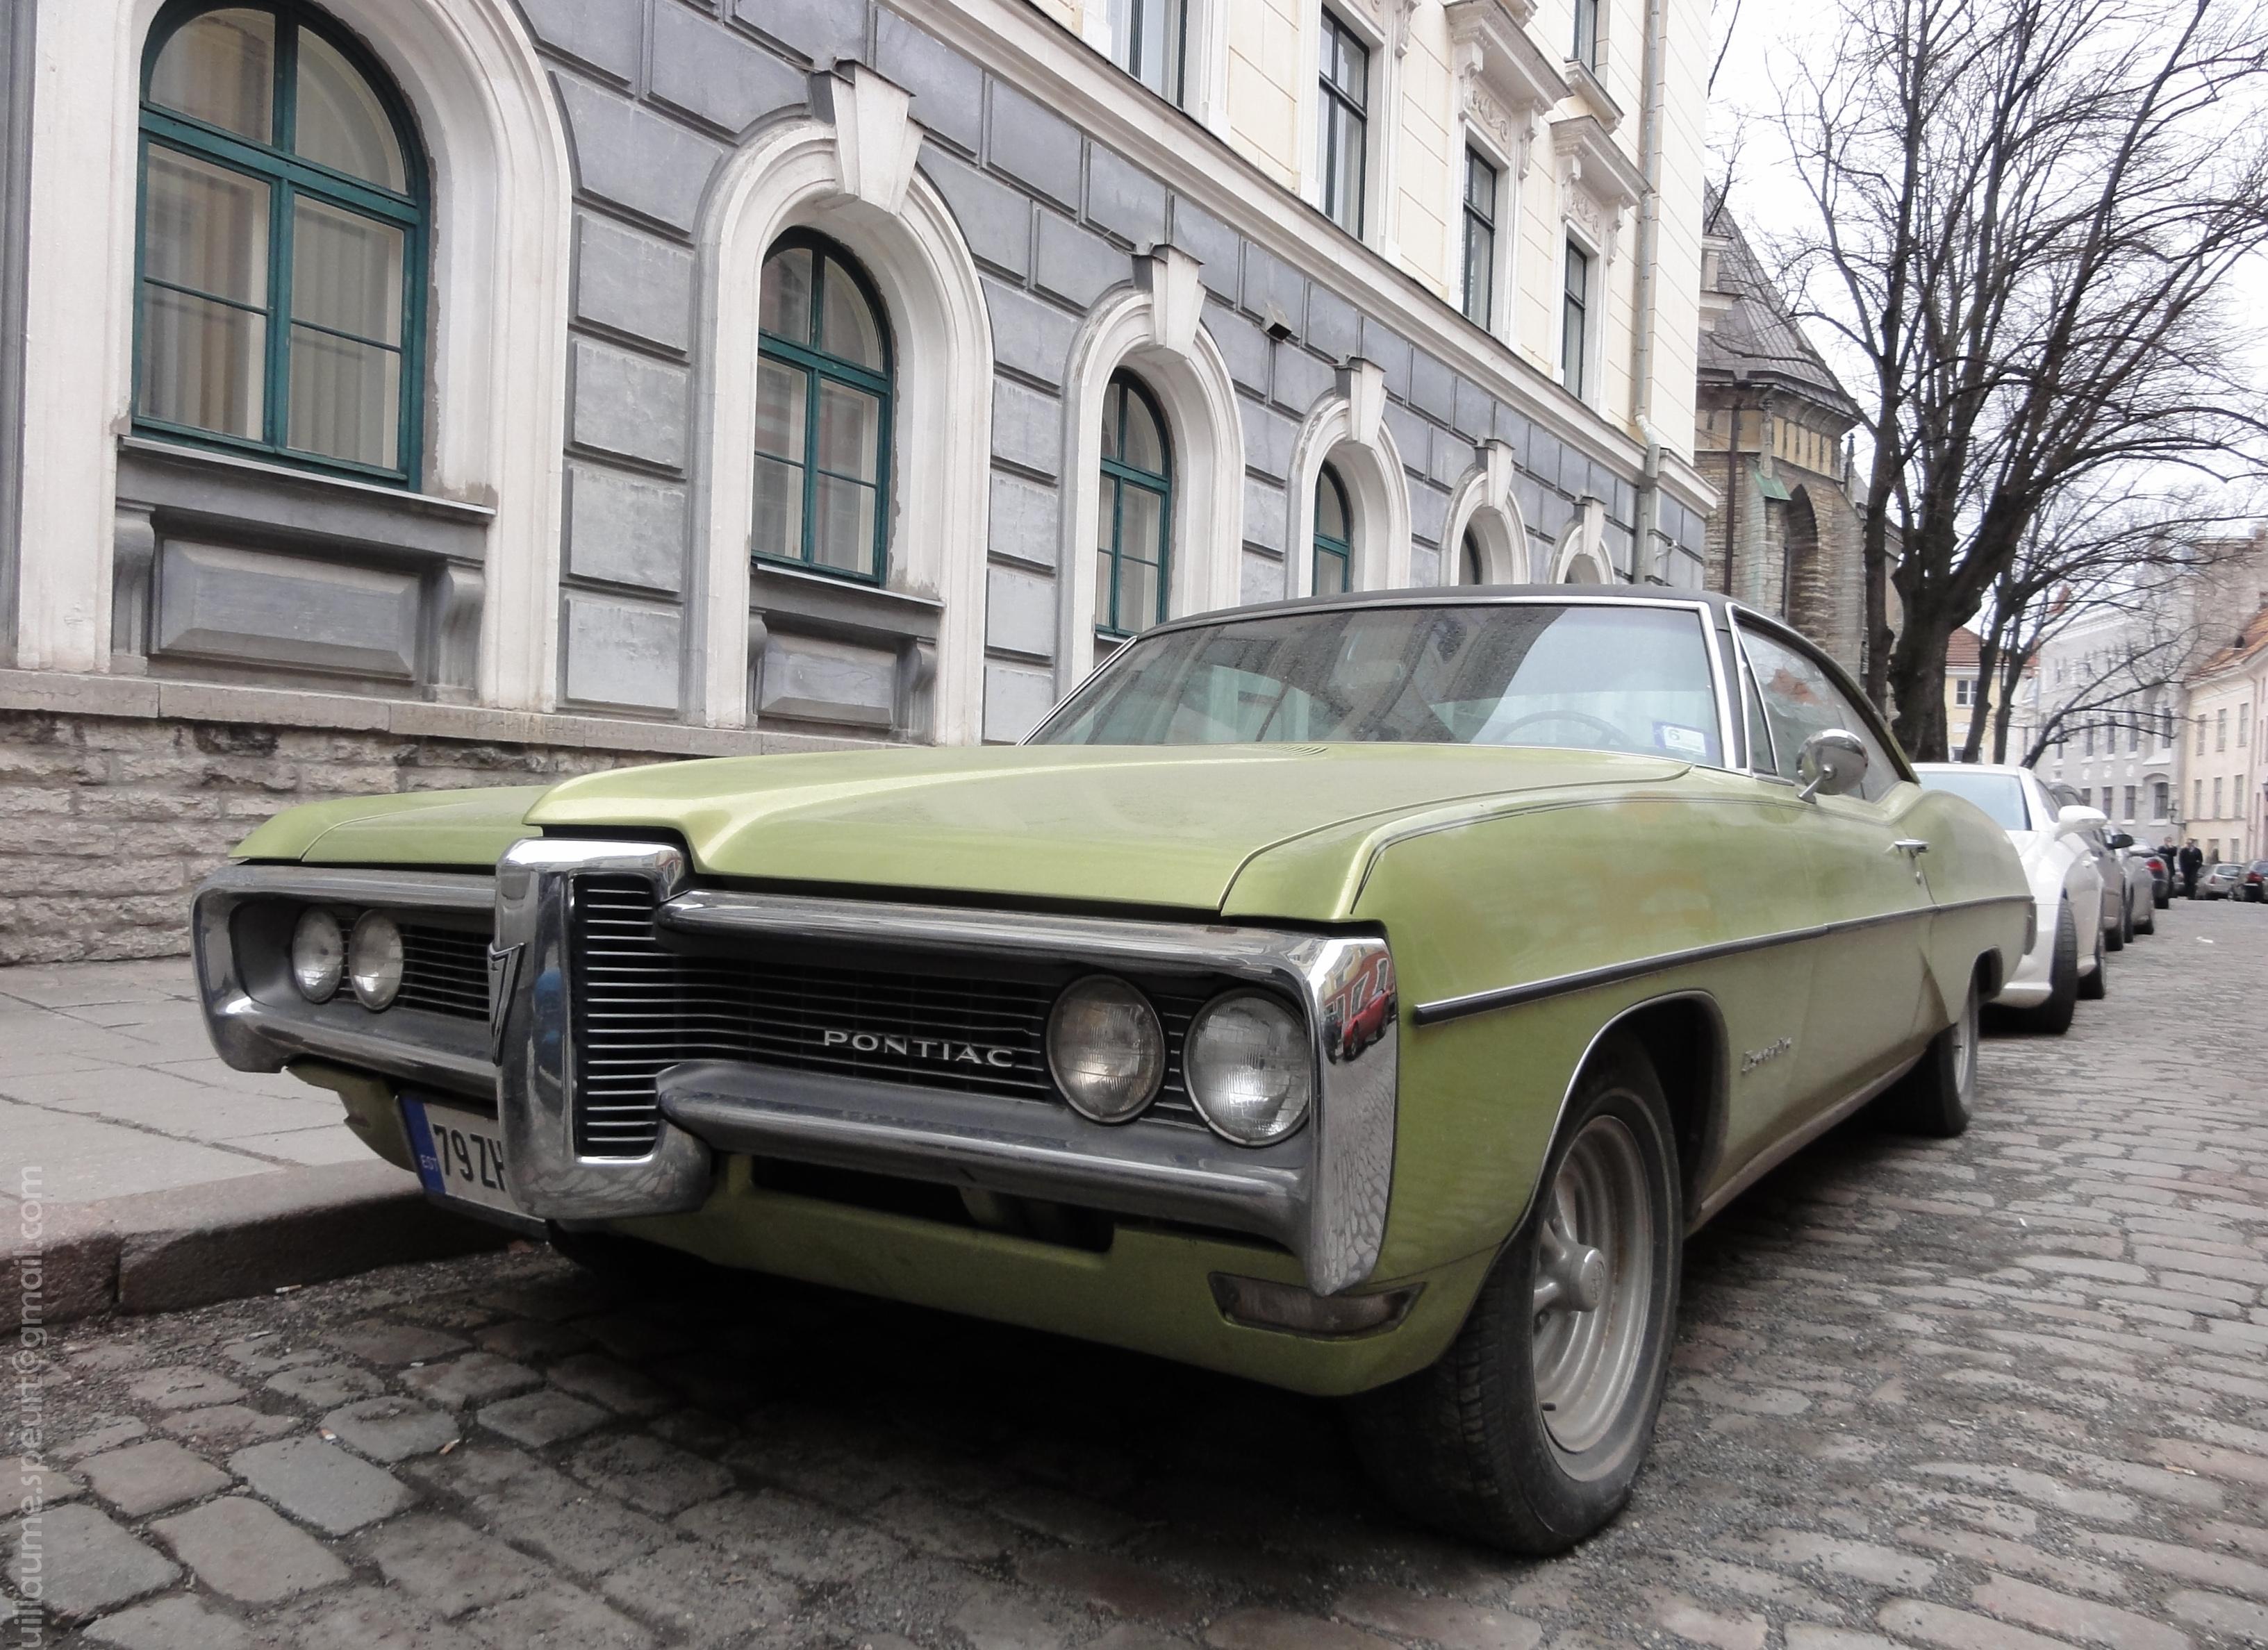 Amnerican Classic Car